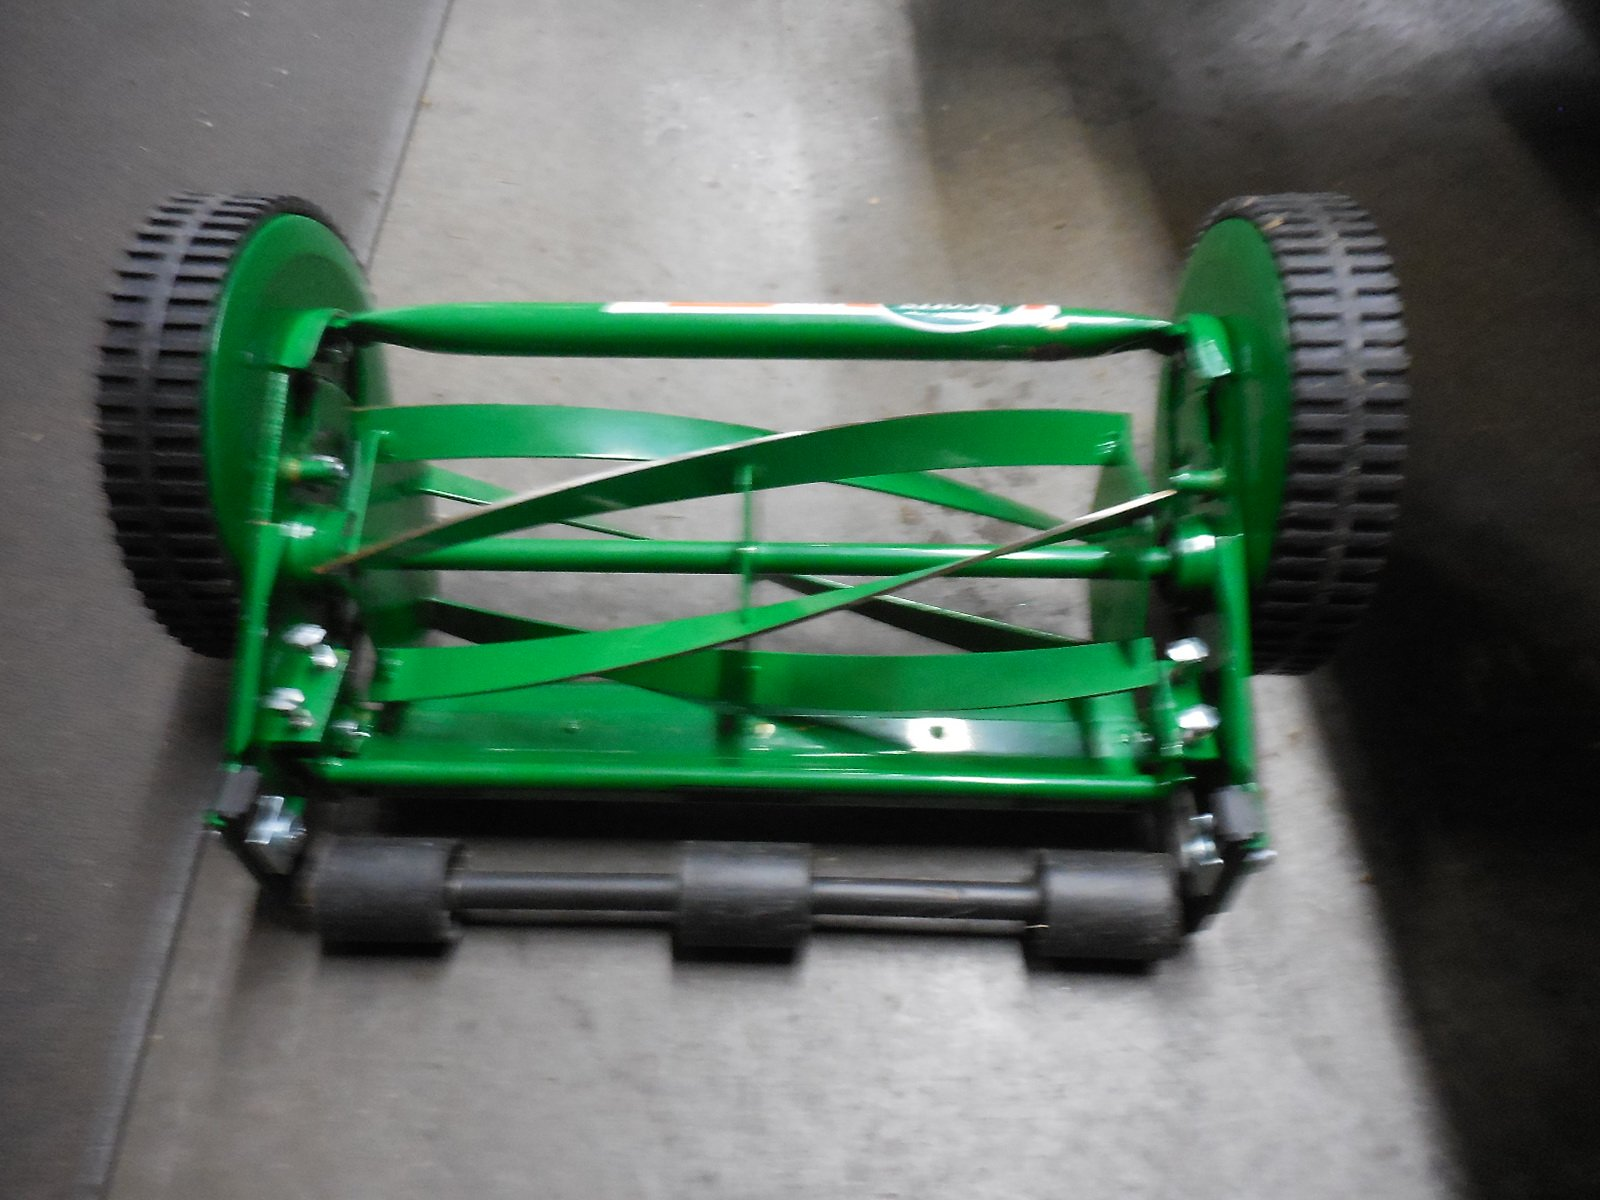 Buy Goplus 14 Inch 12 Amp Lawn Mower W Grass Bag Folding